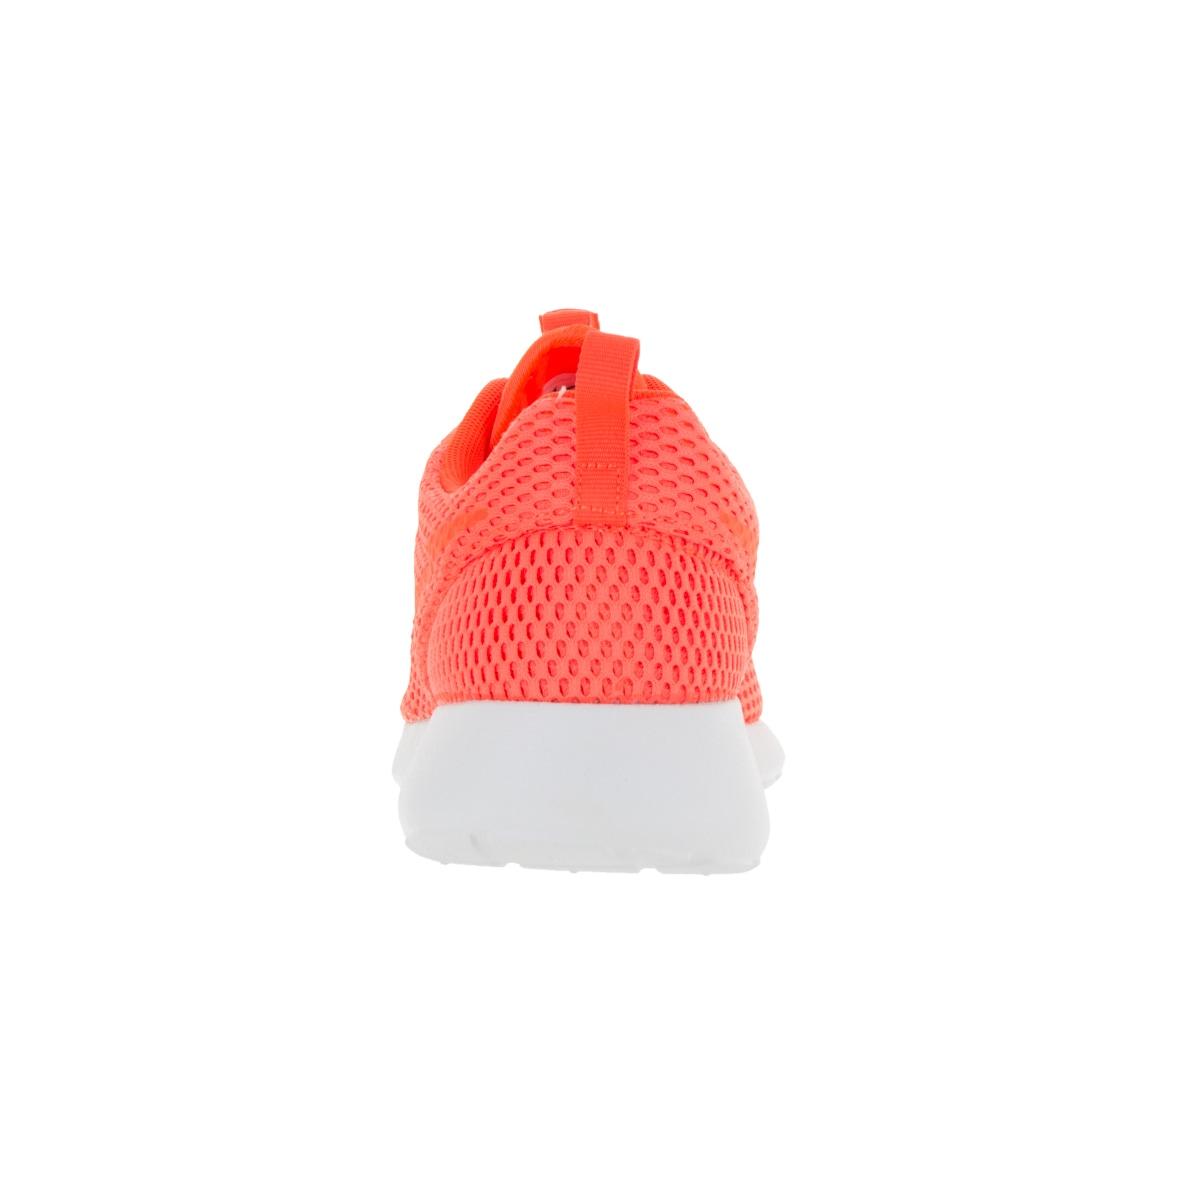 663b20a77309 Shop Nike Men s Roshe One Hyp Br Total Crimson Ttl Crmsn White Running Shoe  - Free Shipping Today - Overstock - 13394471